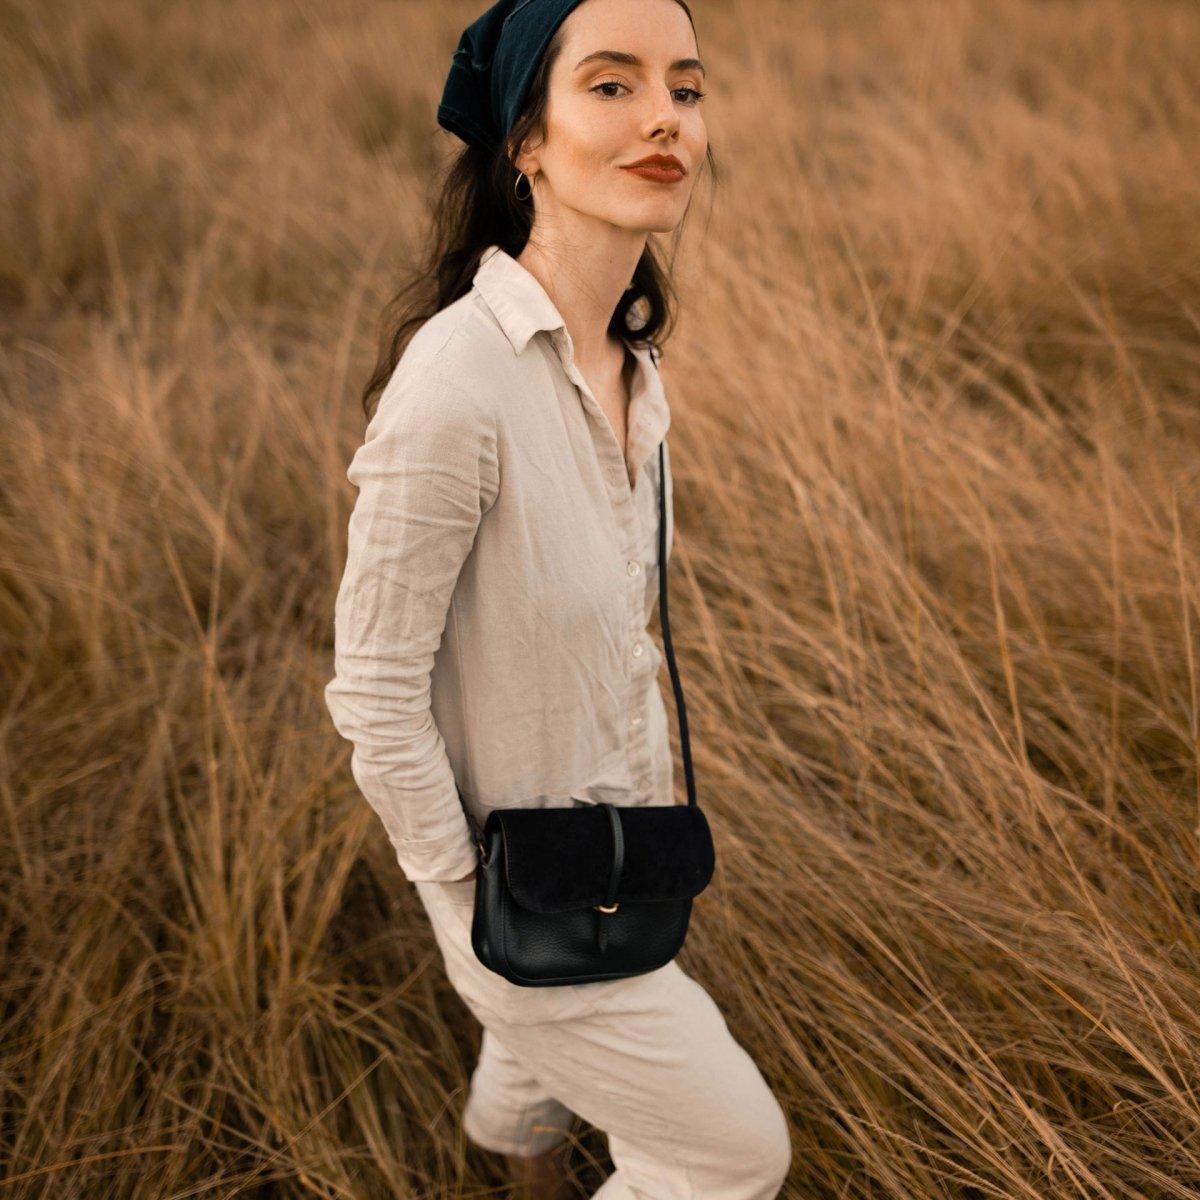 Pastis handbag - White (image n°5)